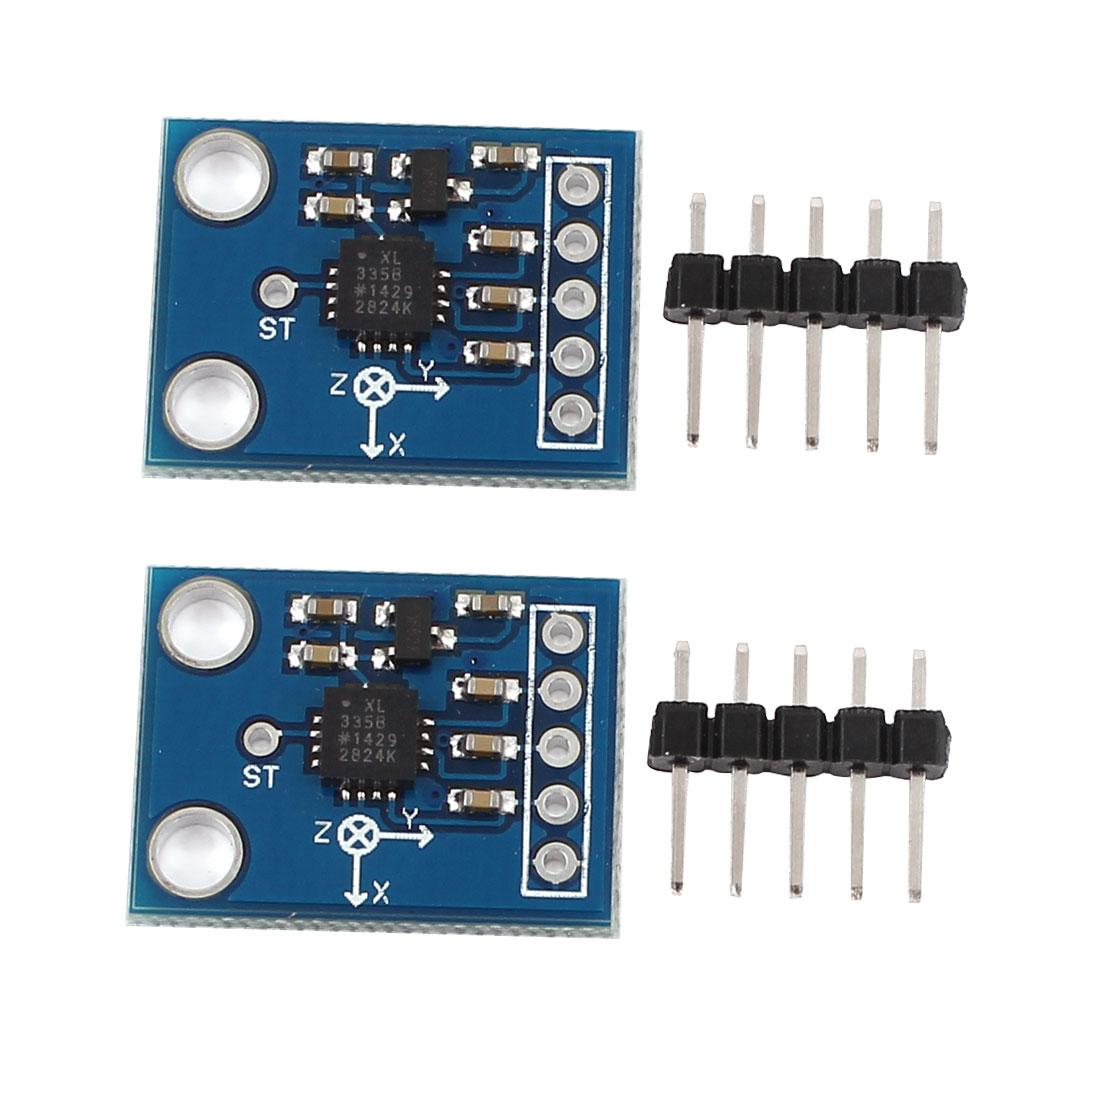 2pcs GY-61 ADXL335 Module 3-axis Analog Output Accelerometer Angular Transducer